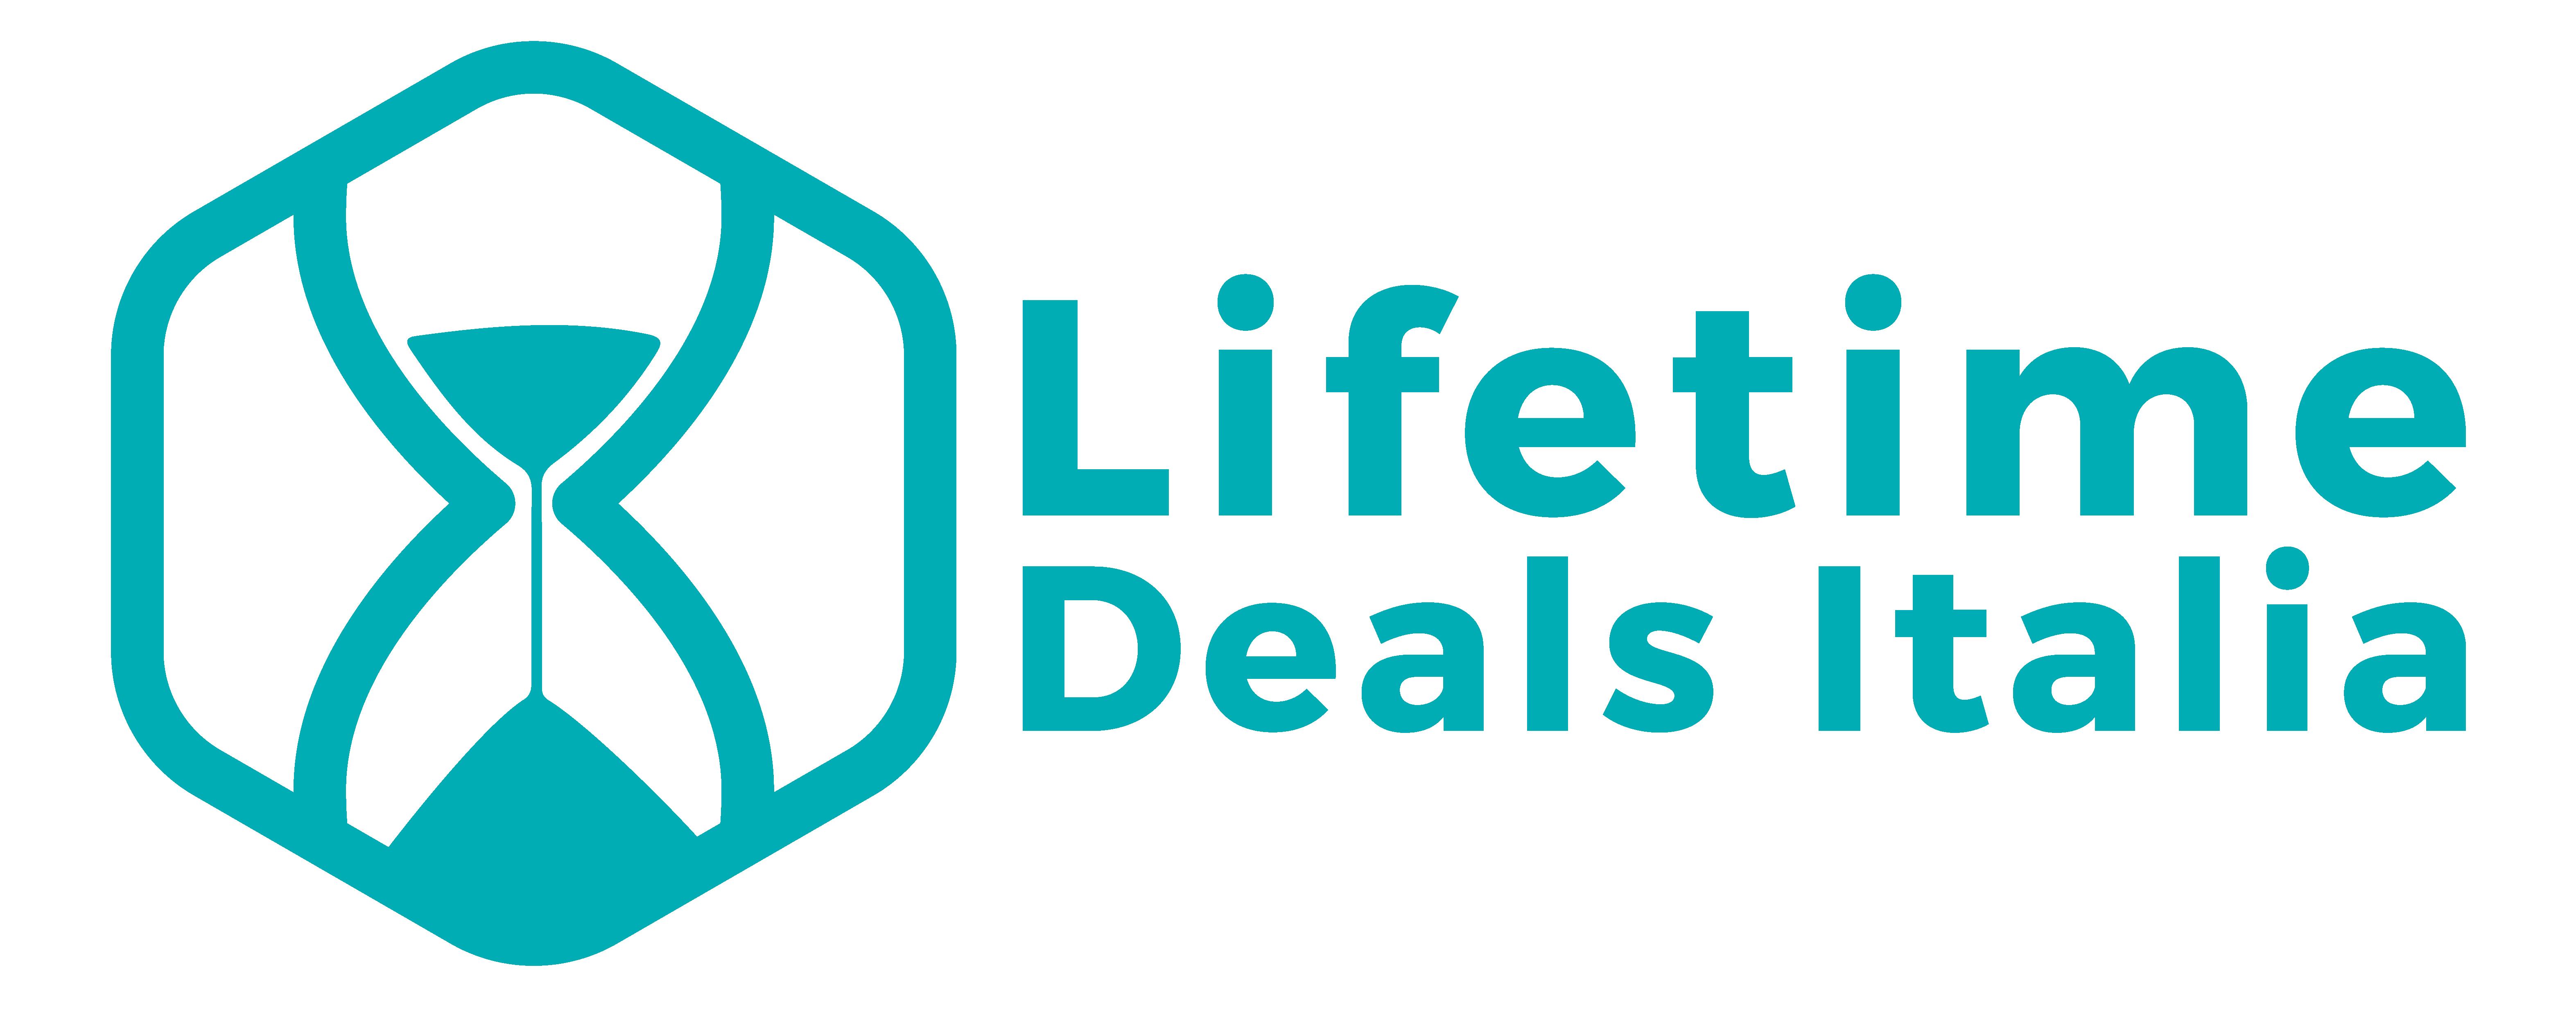 Lifetime Deals Italia - Logo e Testo - Header